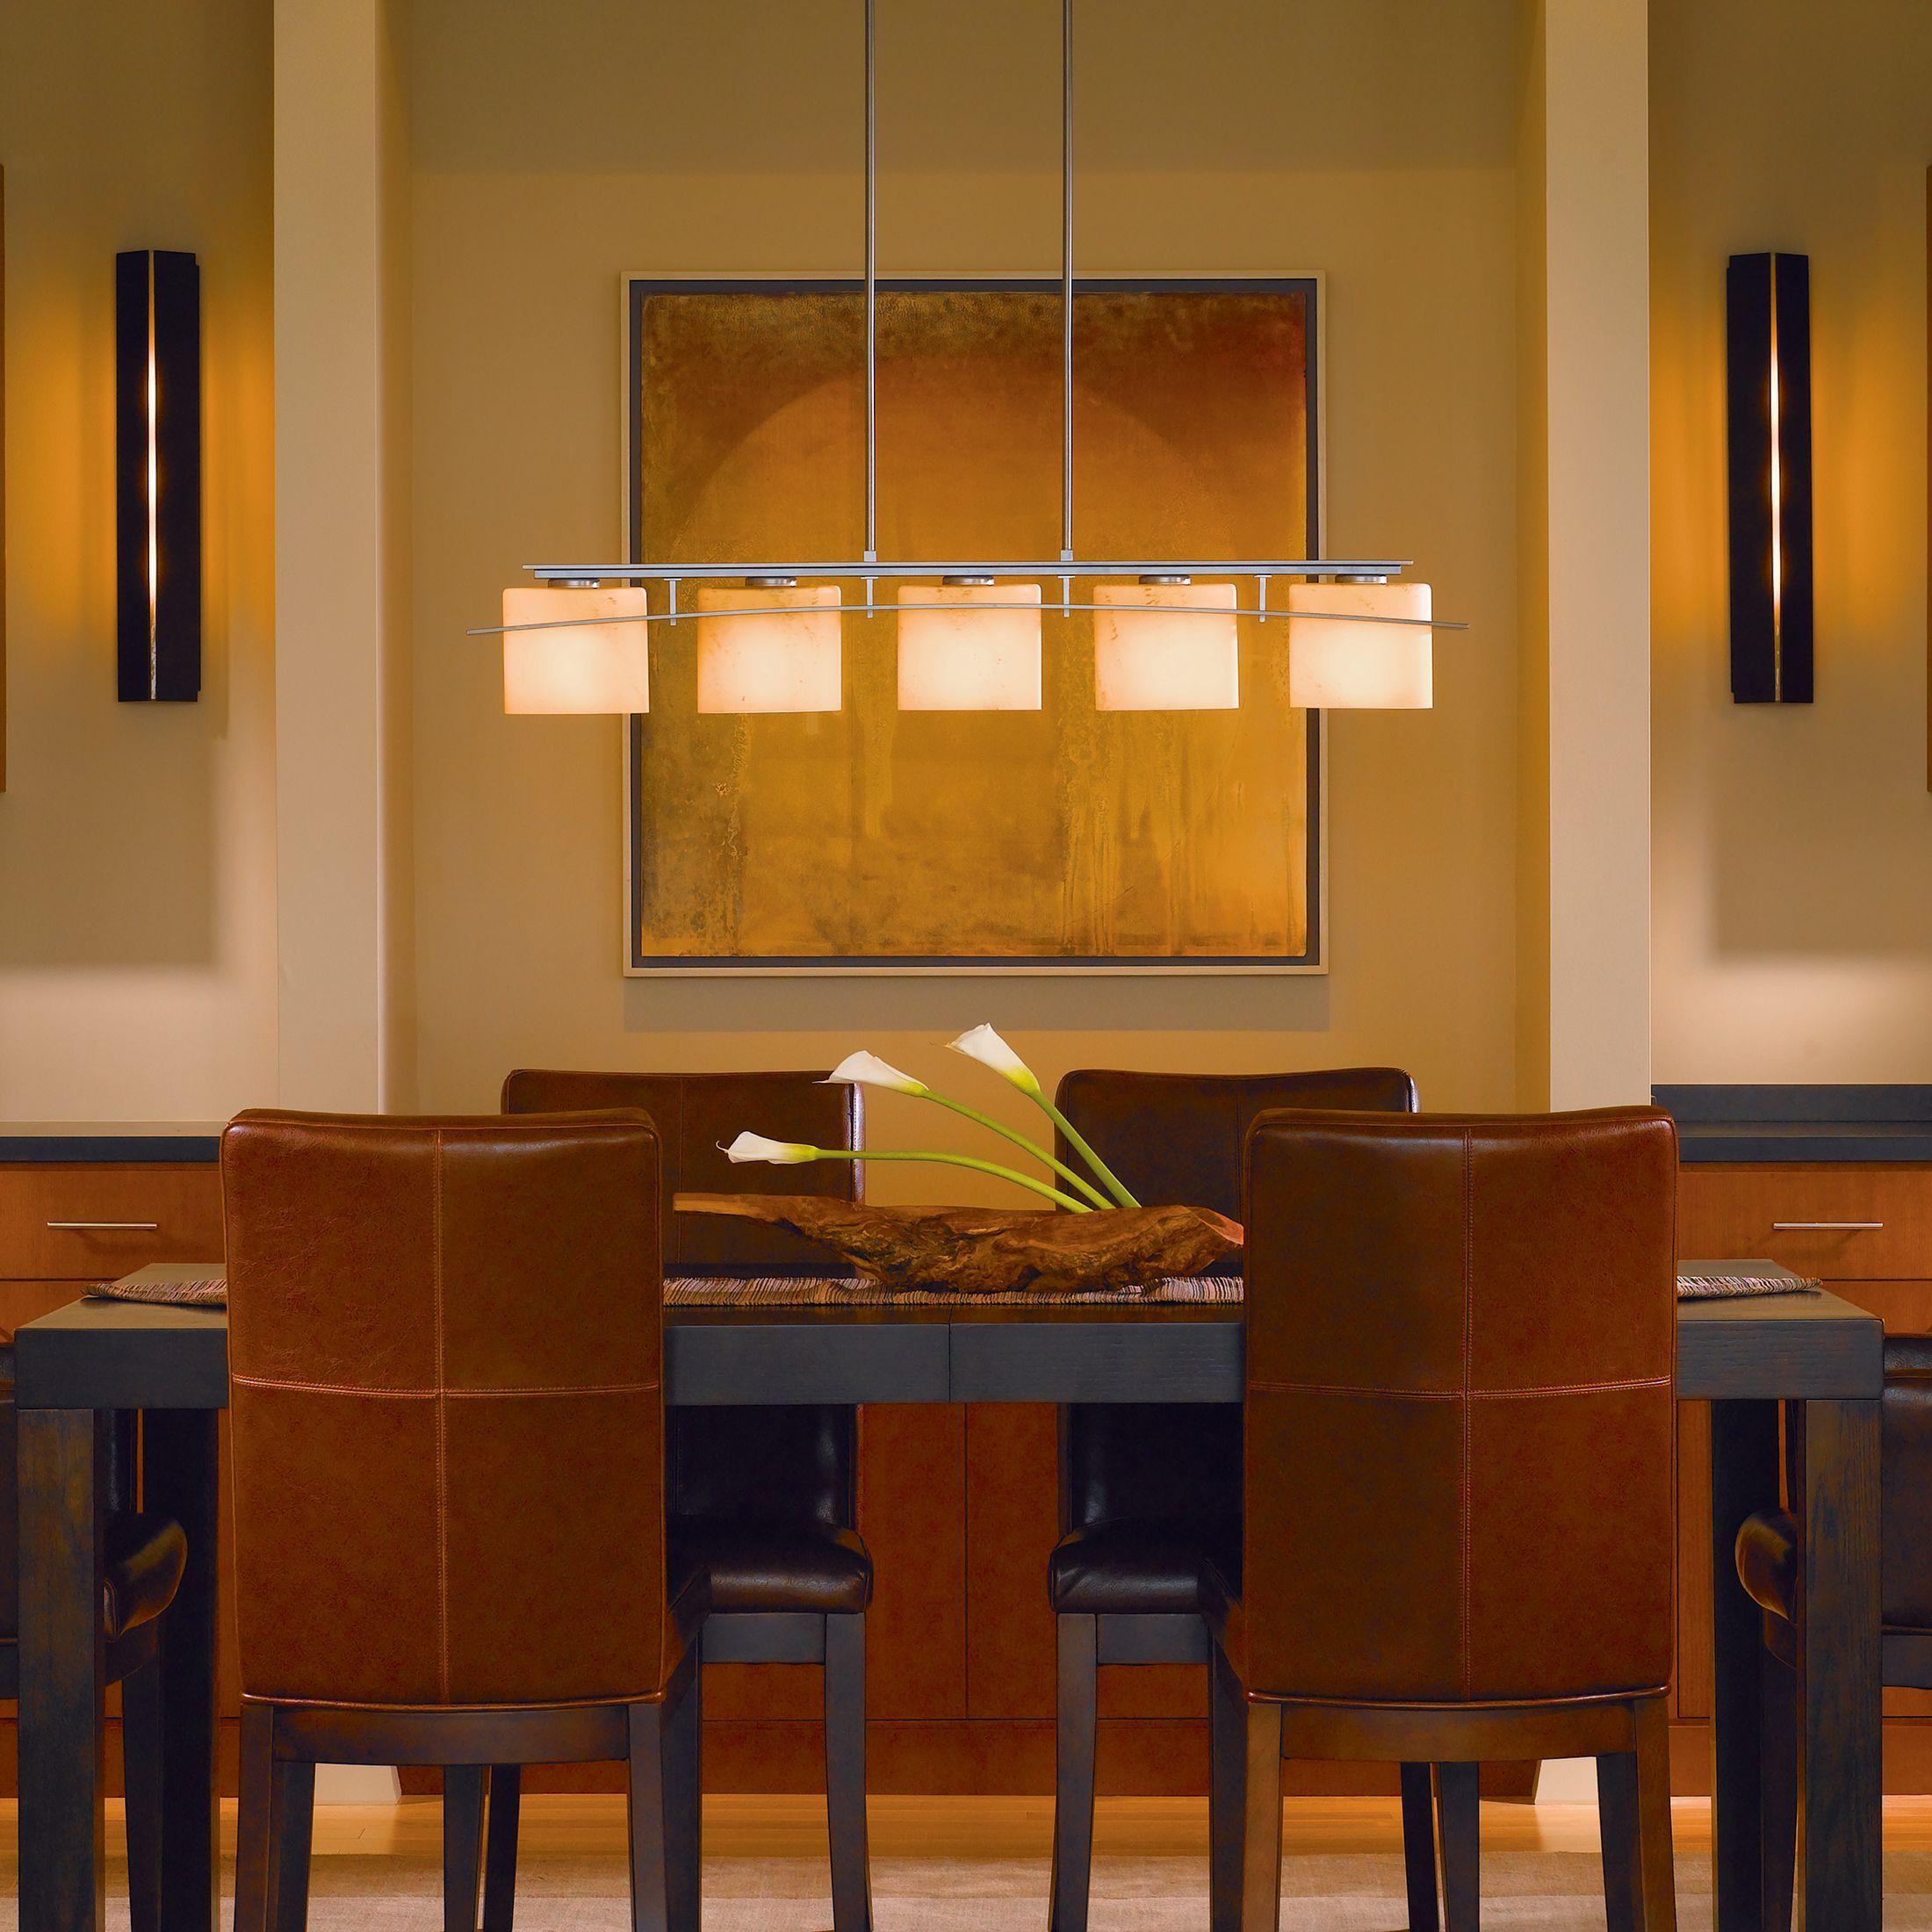 217650 07 C202 Thumb 3 Wall Sconce Lighting Kitchen